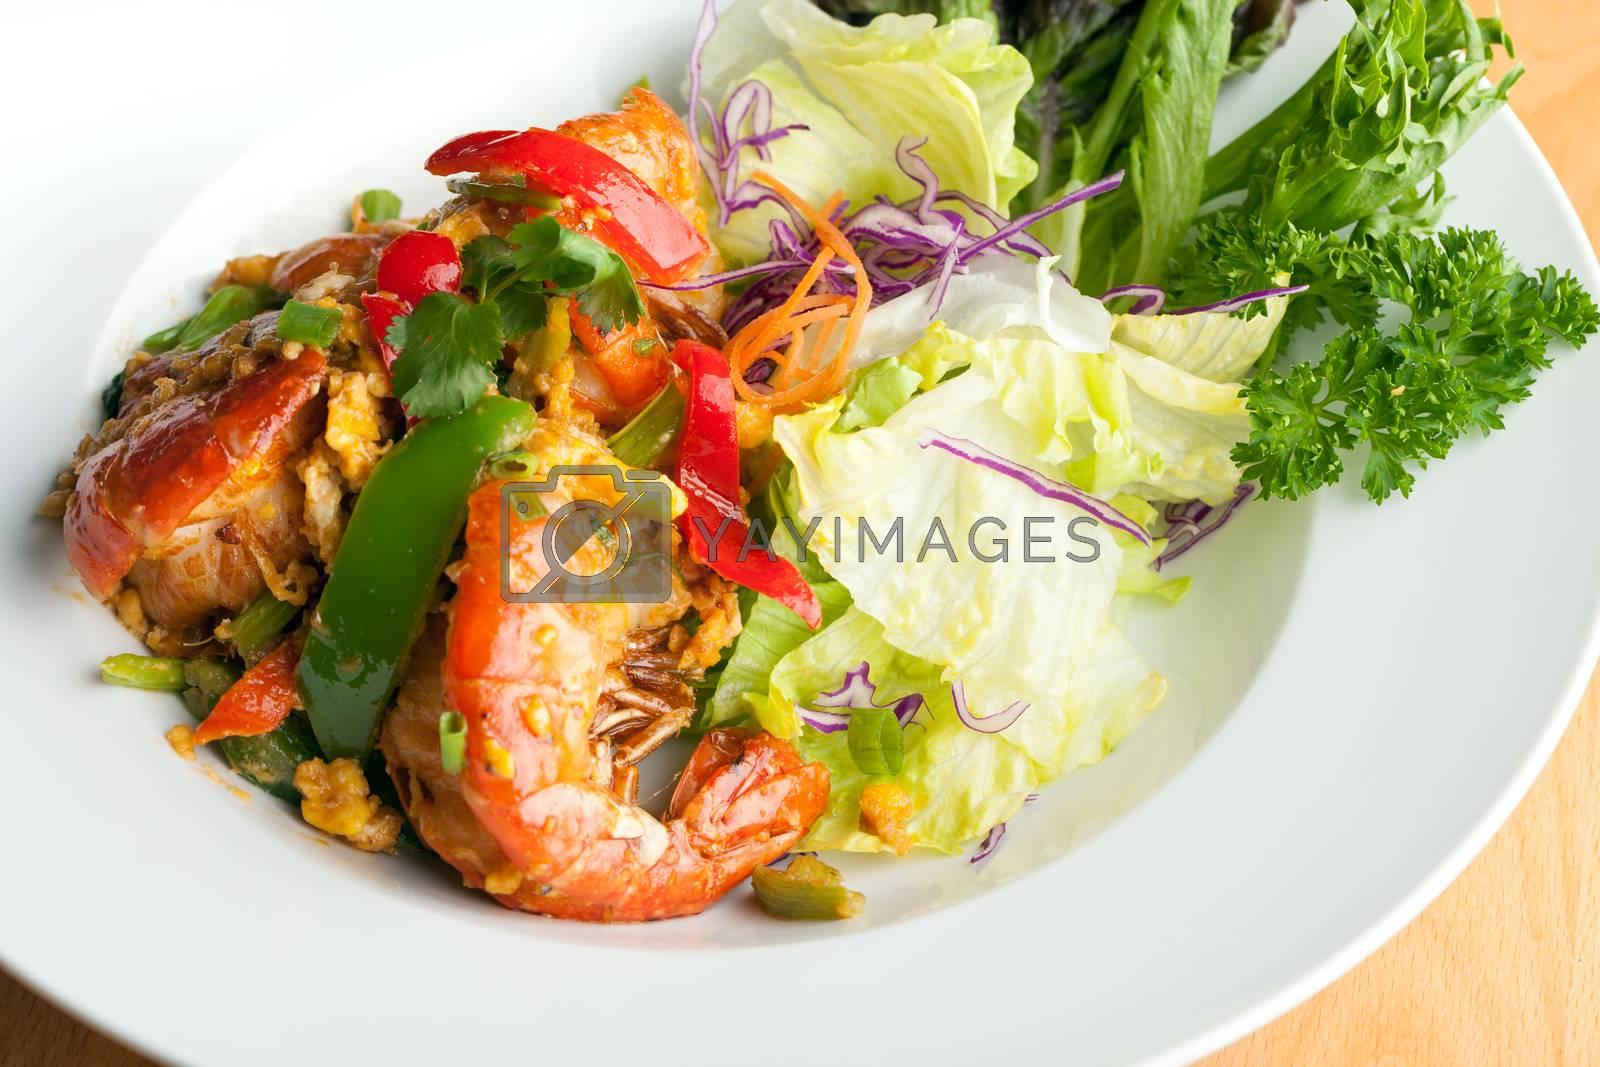 Thai jumbo shrimp salad on a round white plate. Shallow depth of field.